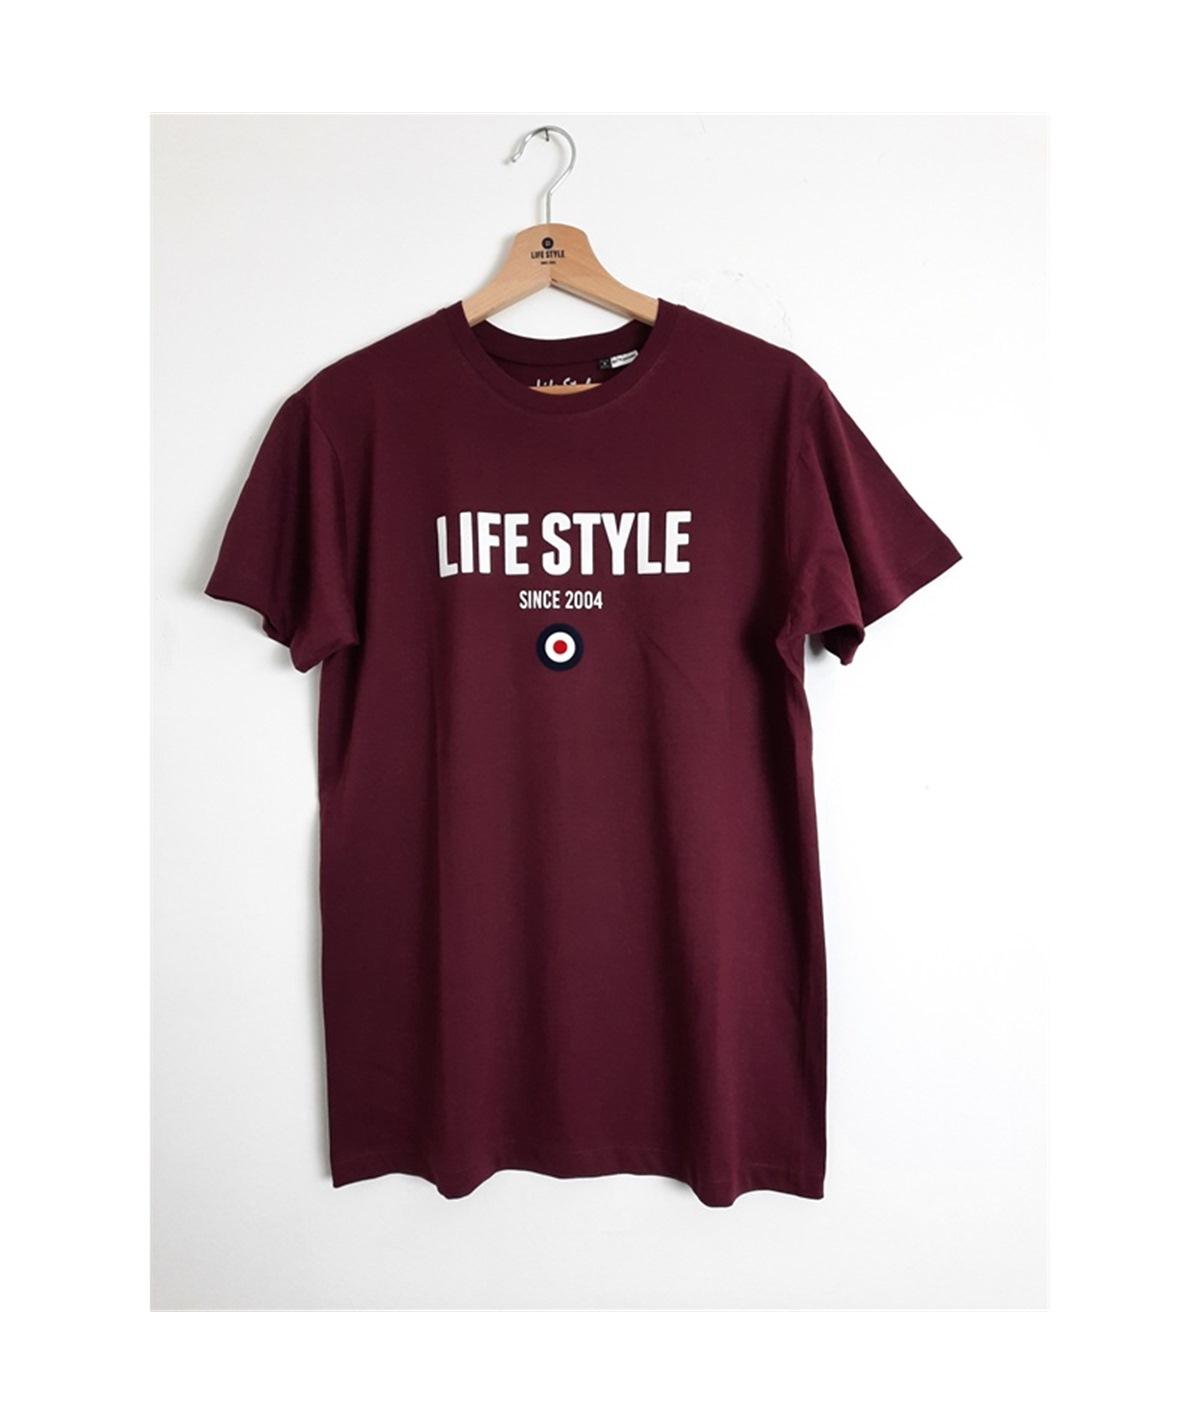 t-shirt life style flock bordeaux 1